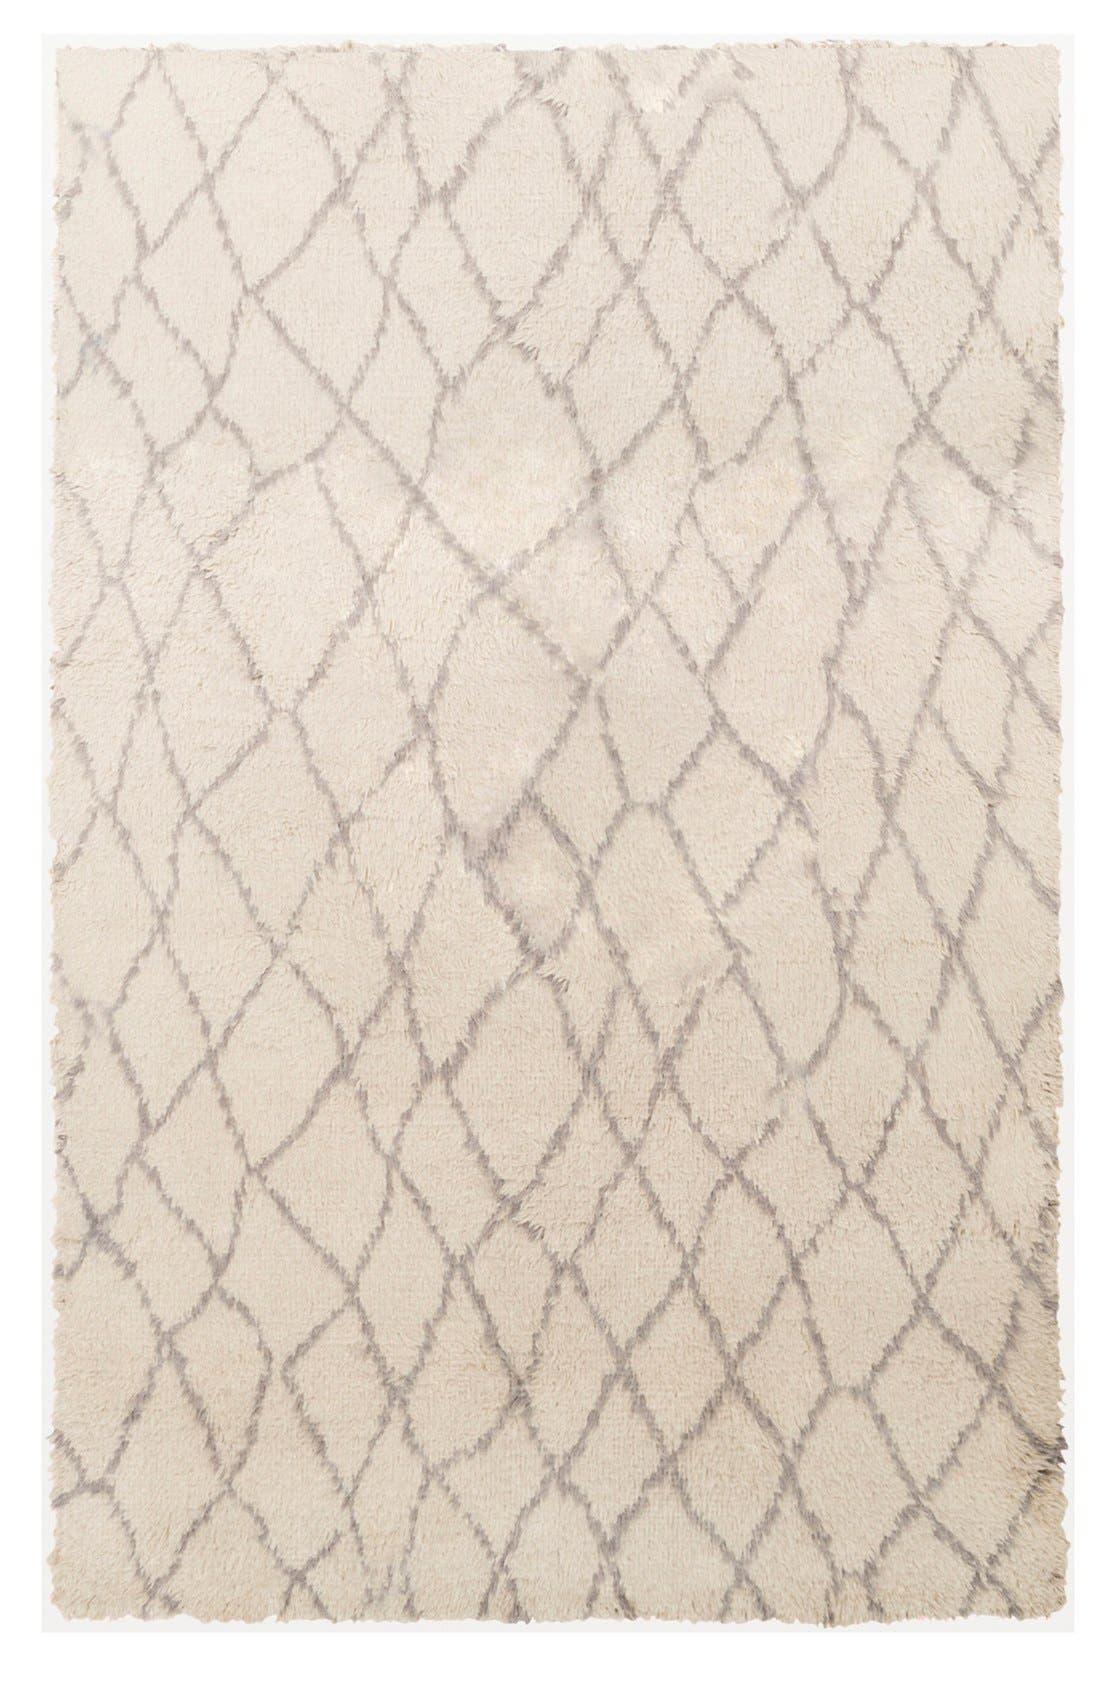 'Denali - Lines' Wool Rug,                             Main thumbnail 1, color,                             BEIGE/ GREY